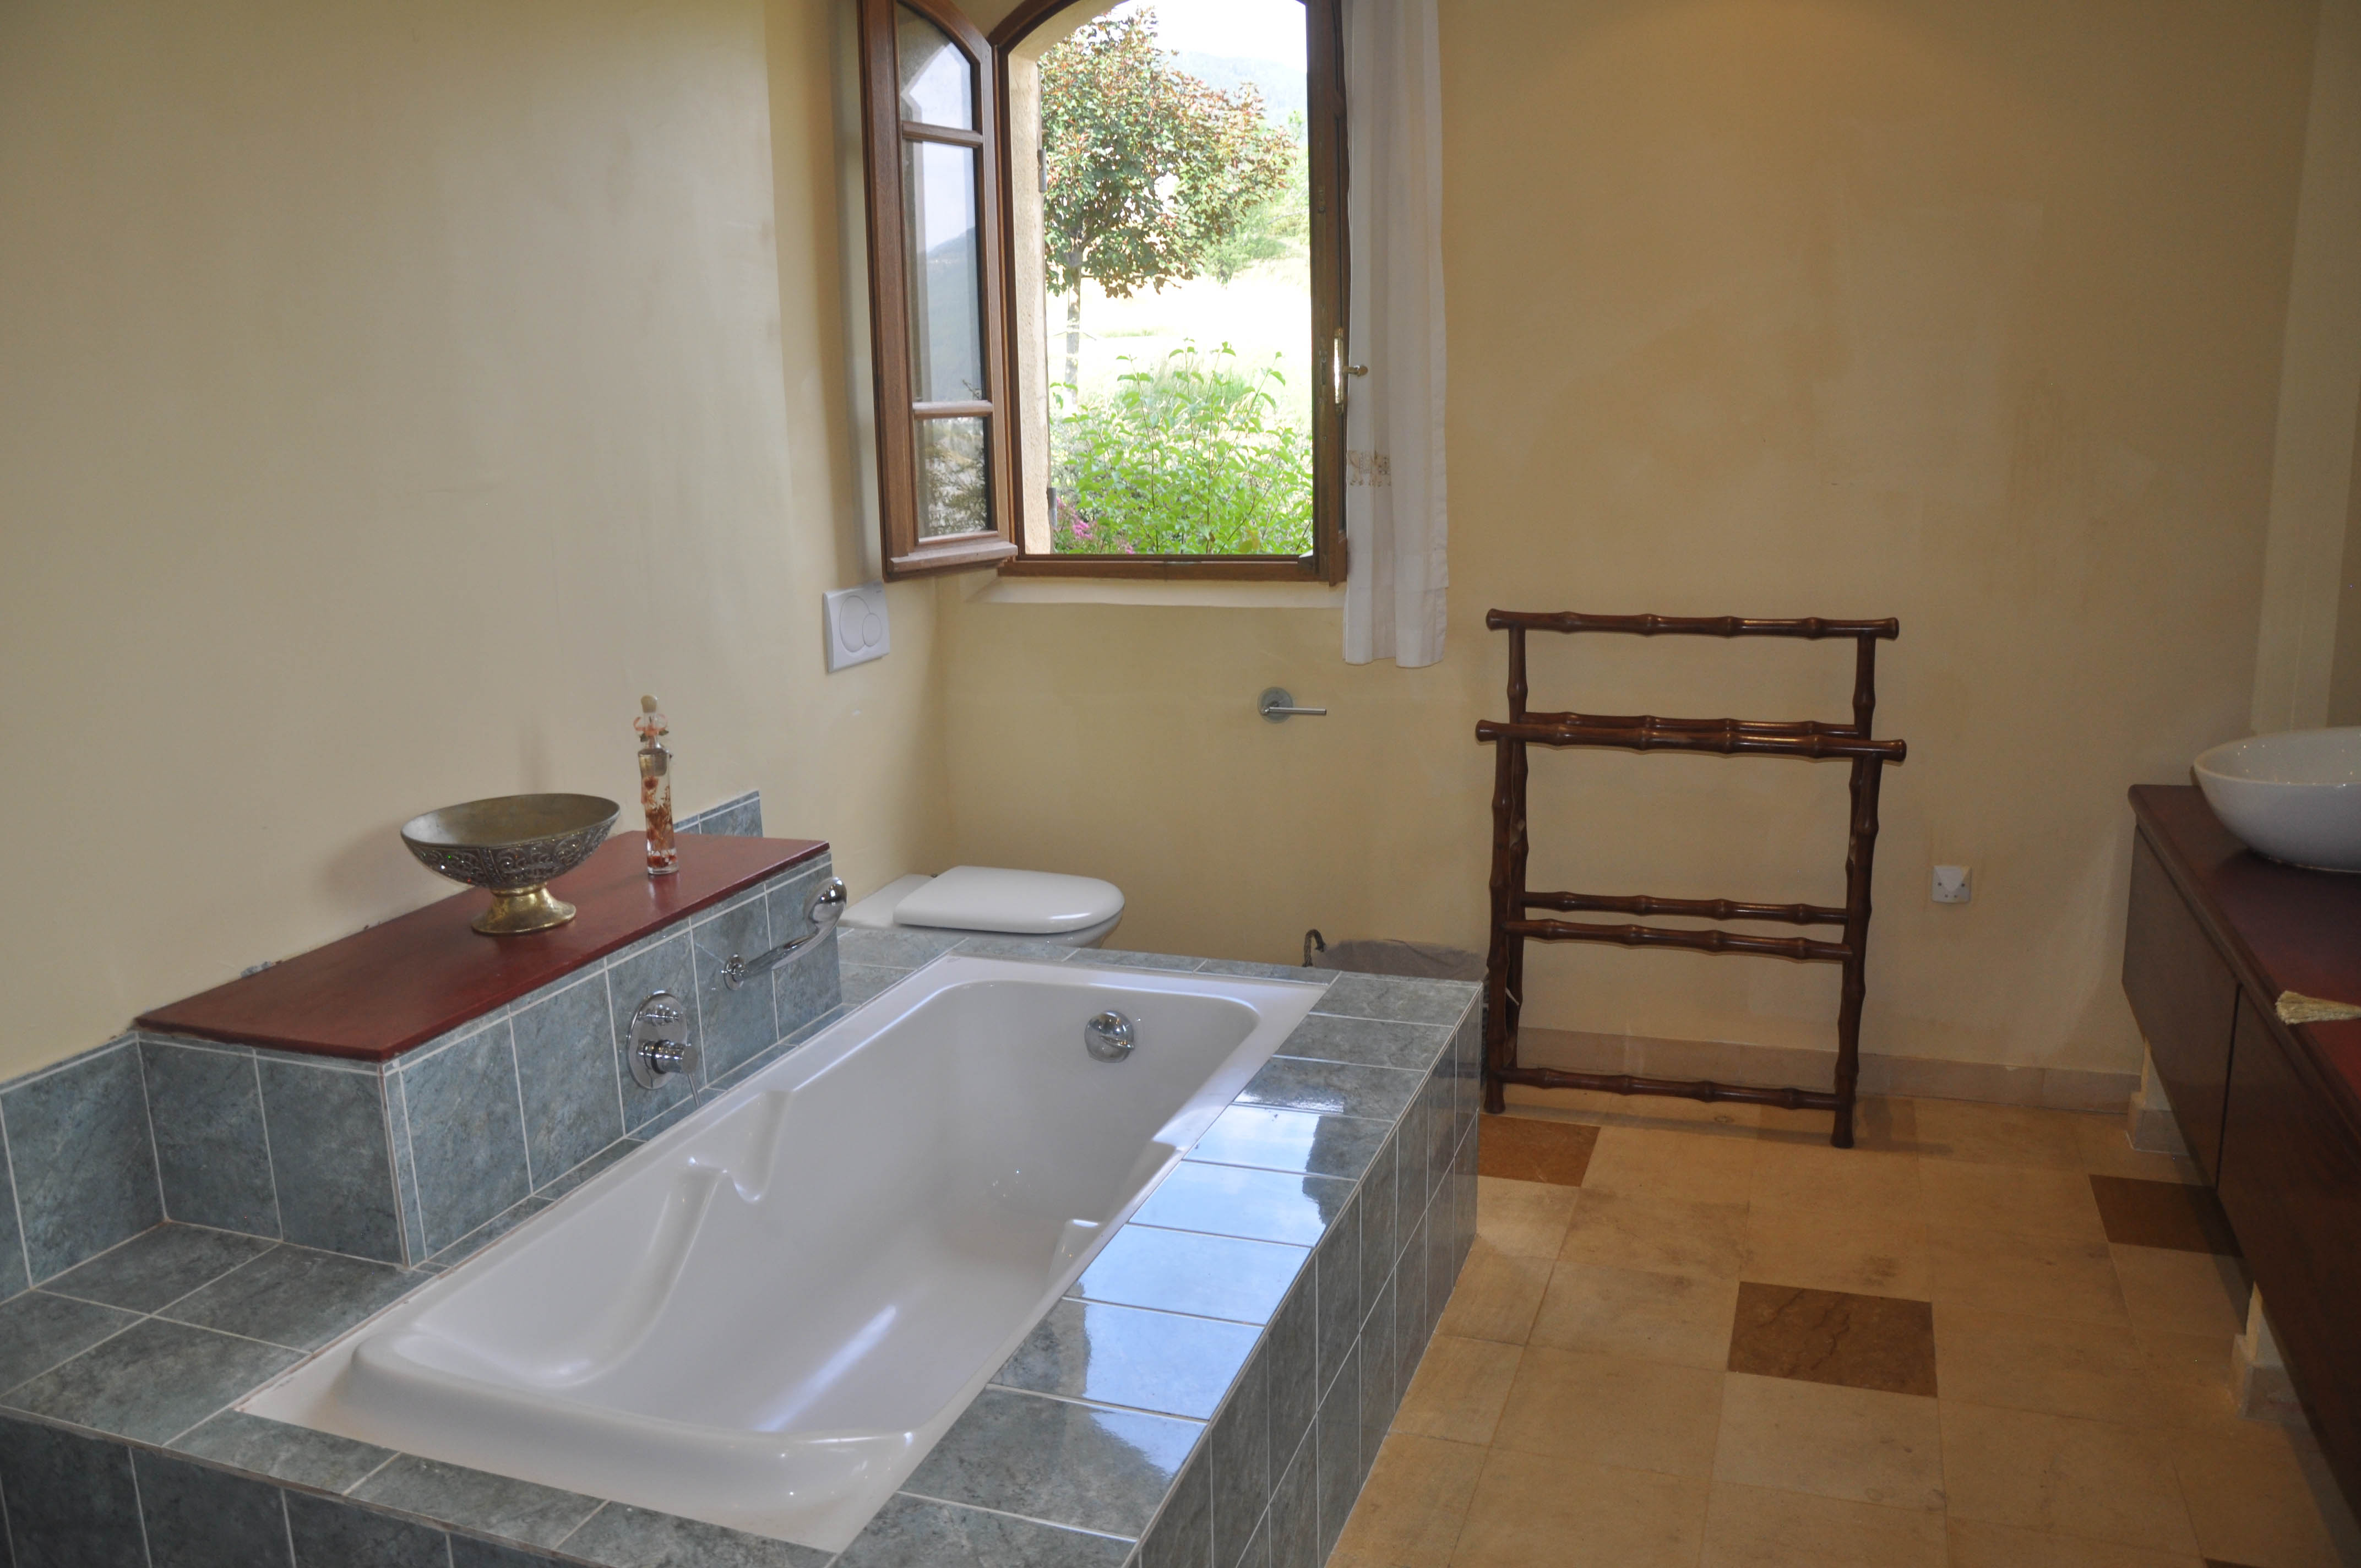 File:Château de Méouilles Salle de bain moderne.jpg ...